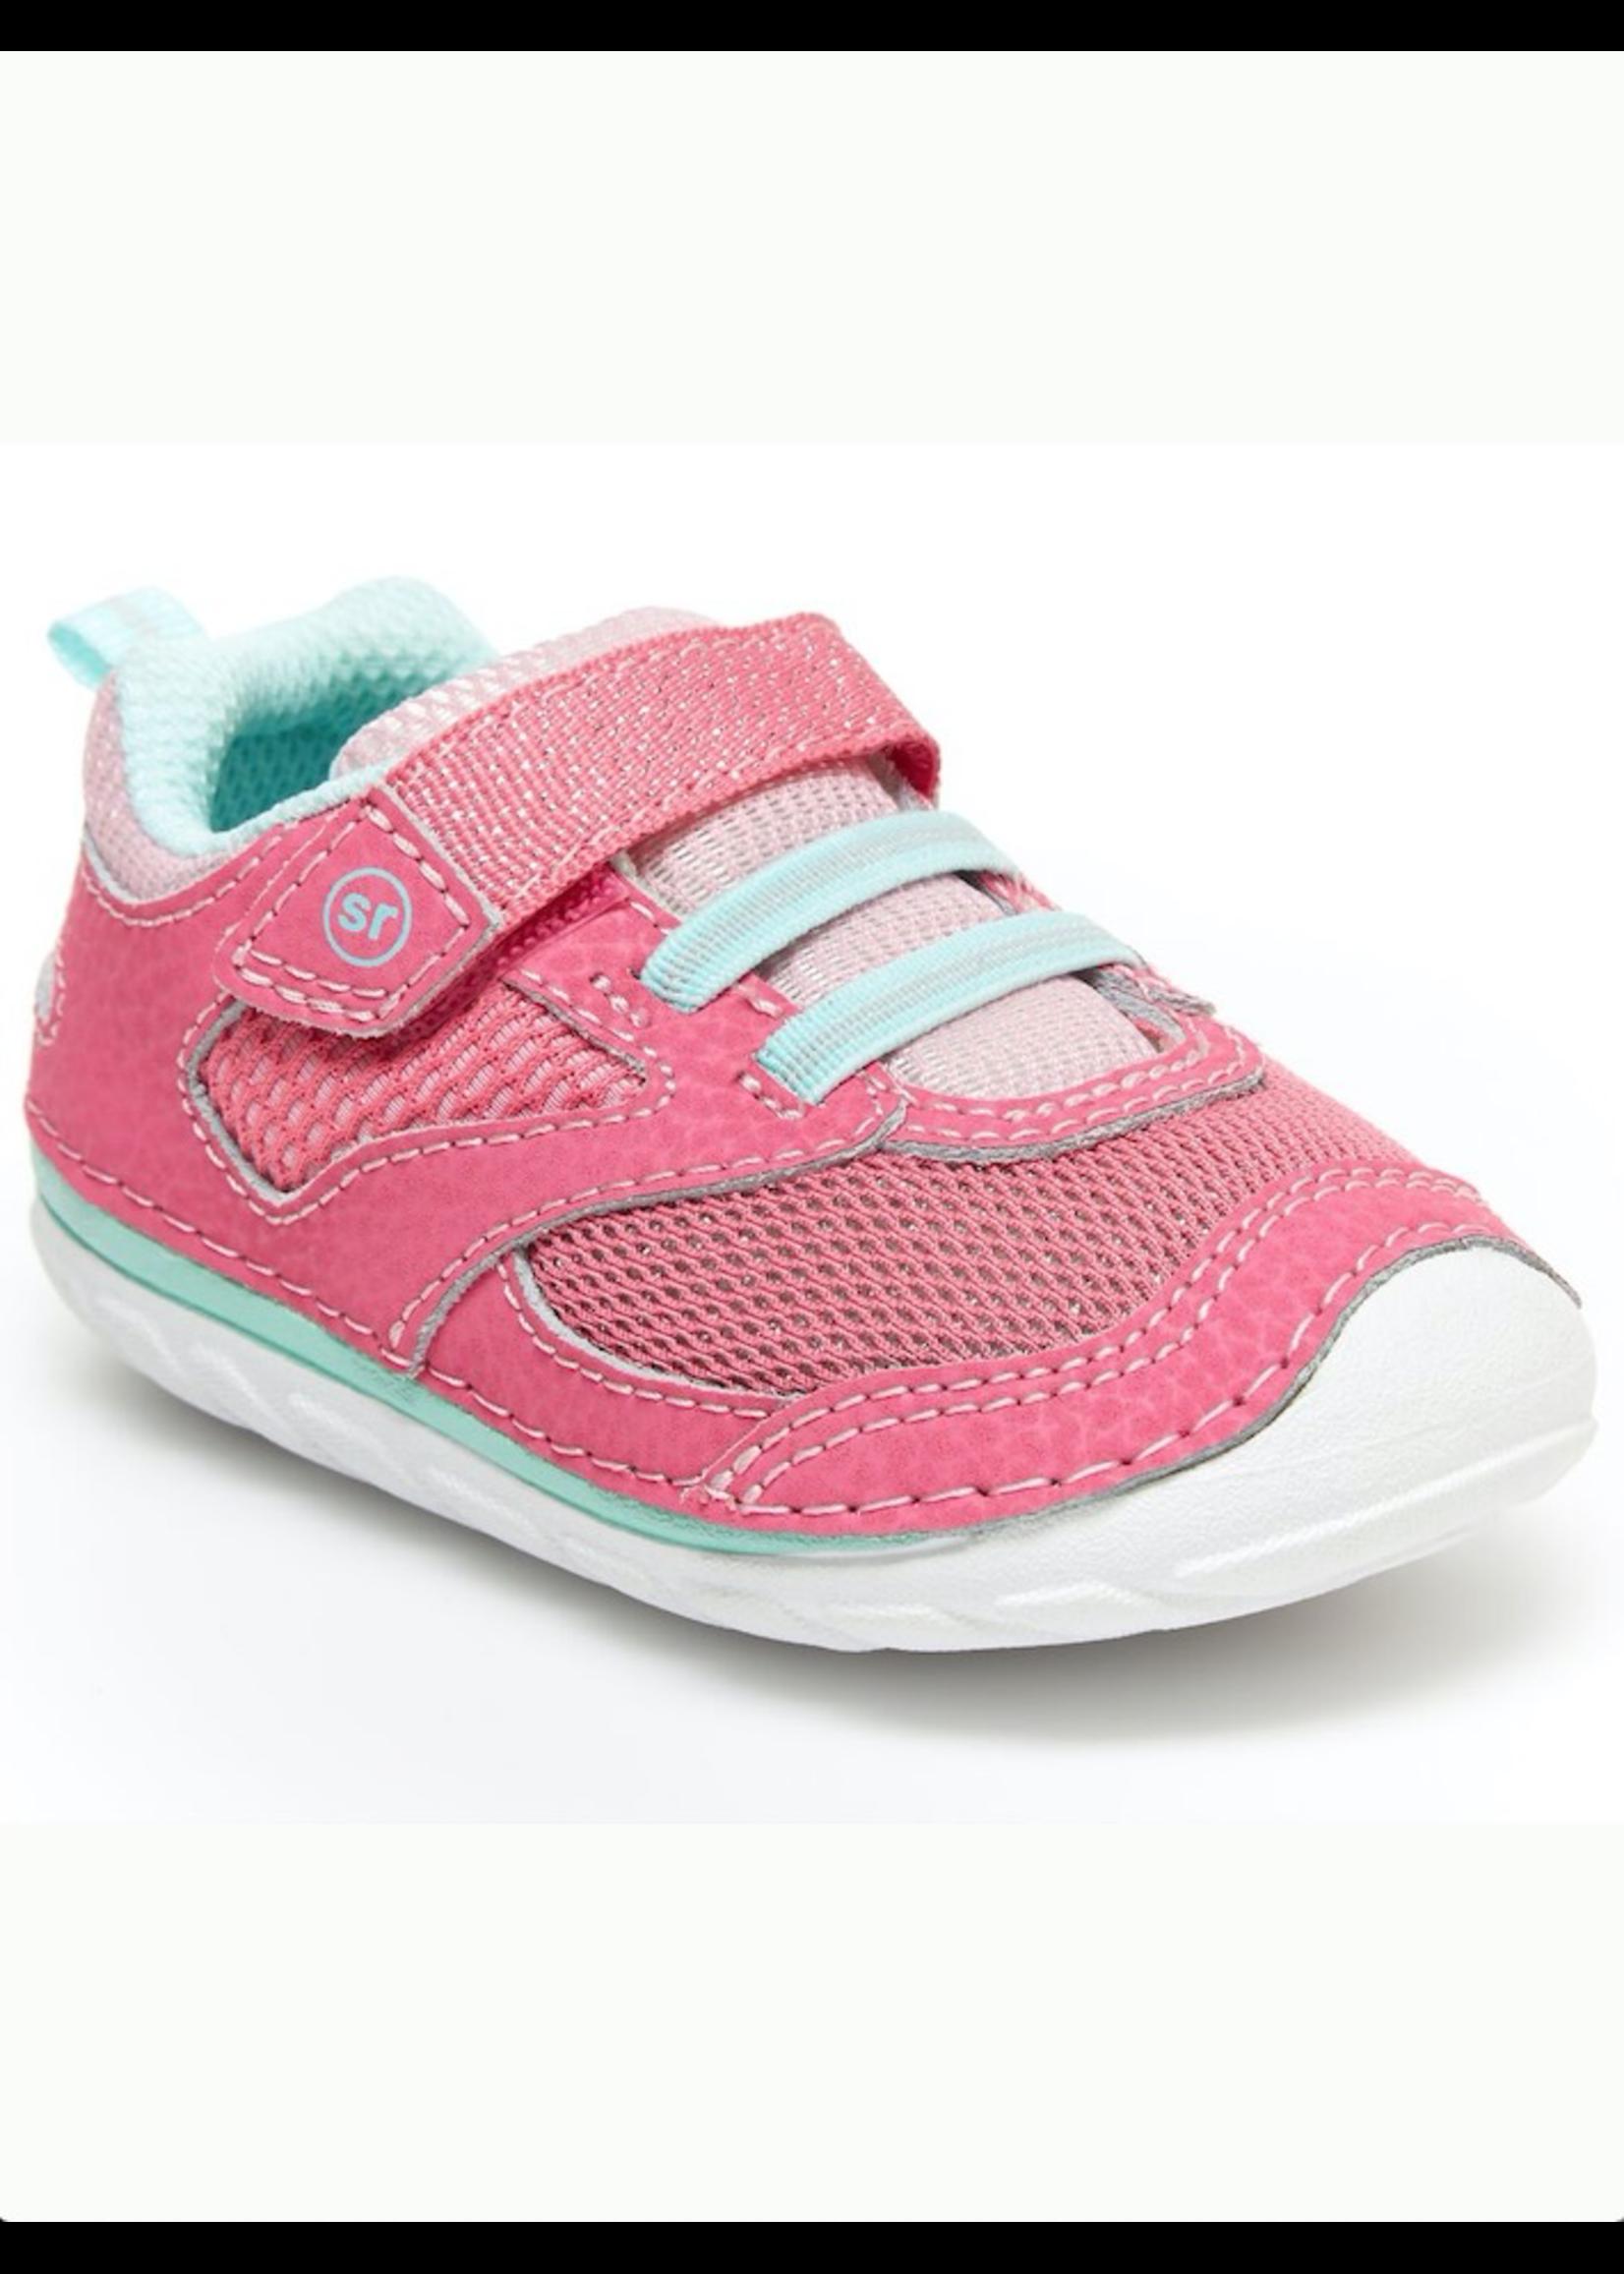 Striderite Stride Rite, Adrian Girl's Soft Motion Sneaker